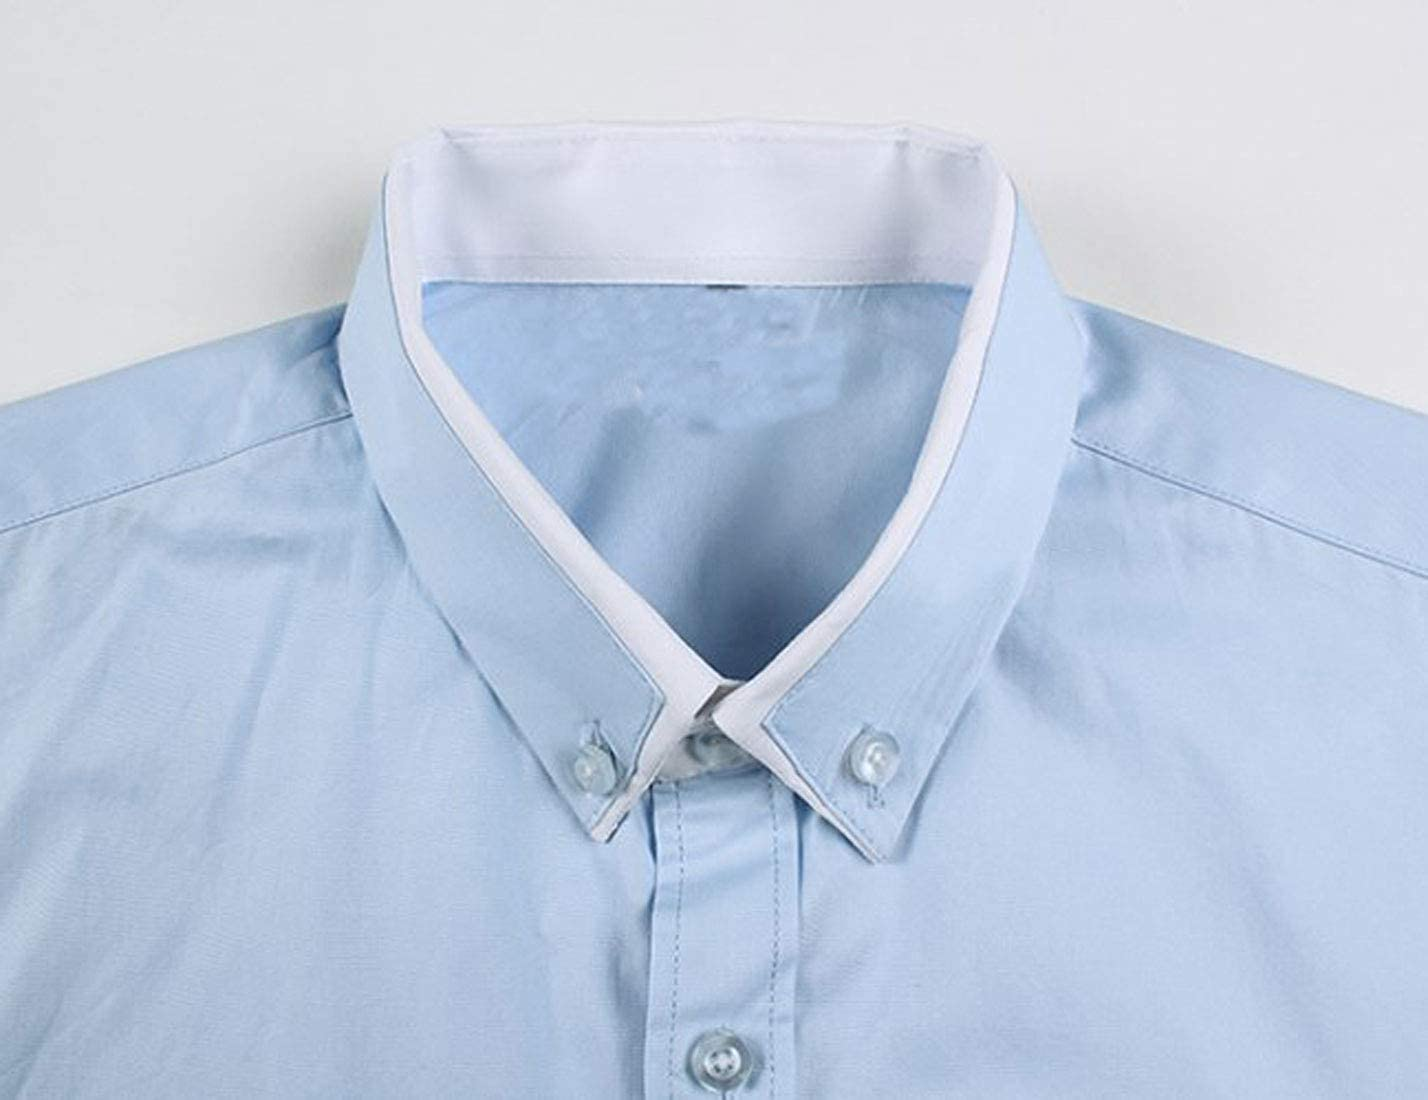 NatrE Men Classic Version Slimming Long Sleeve Fashion Plus-Size Cotton Shirt